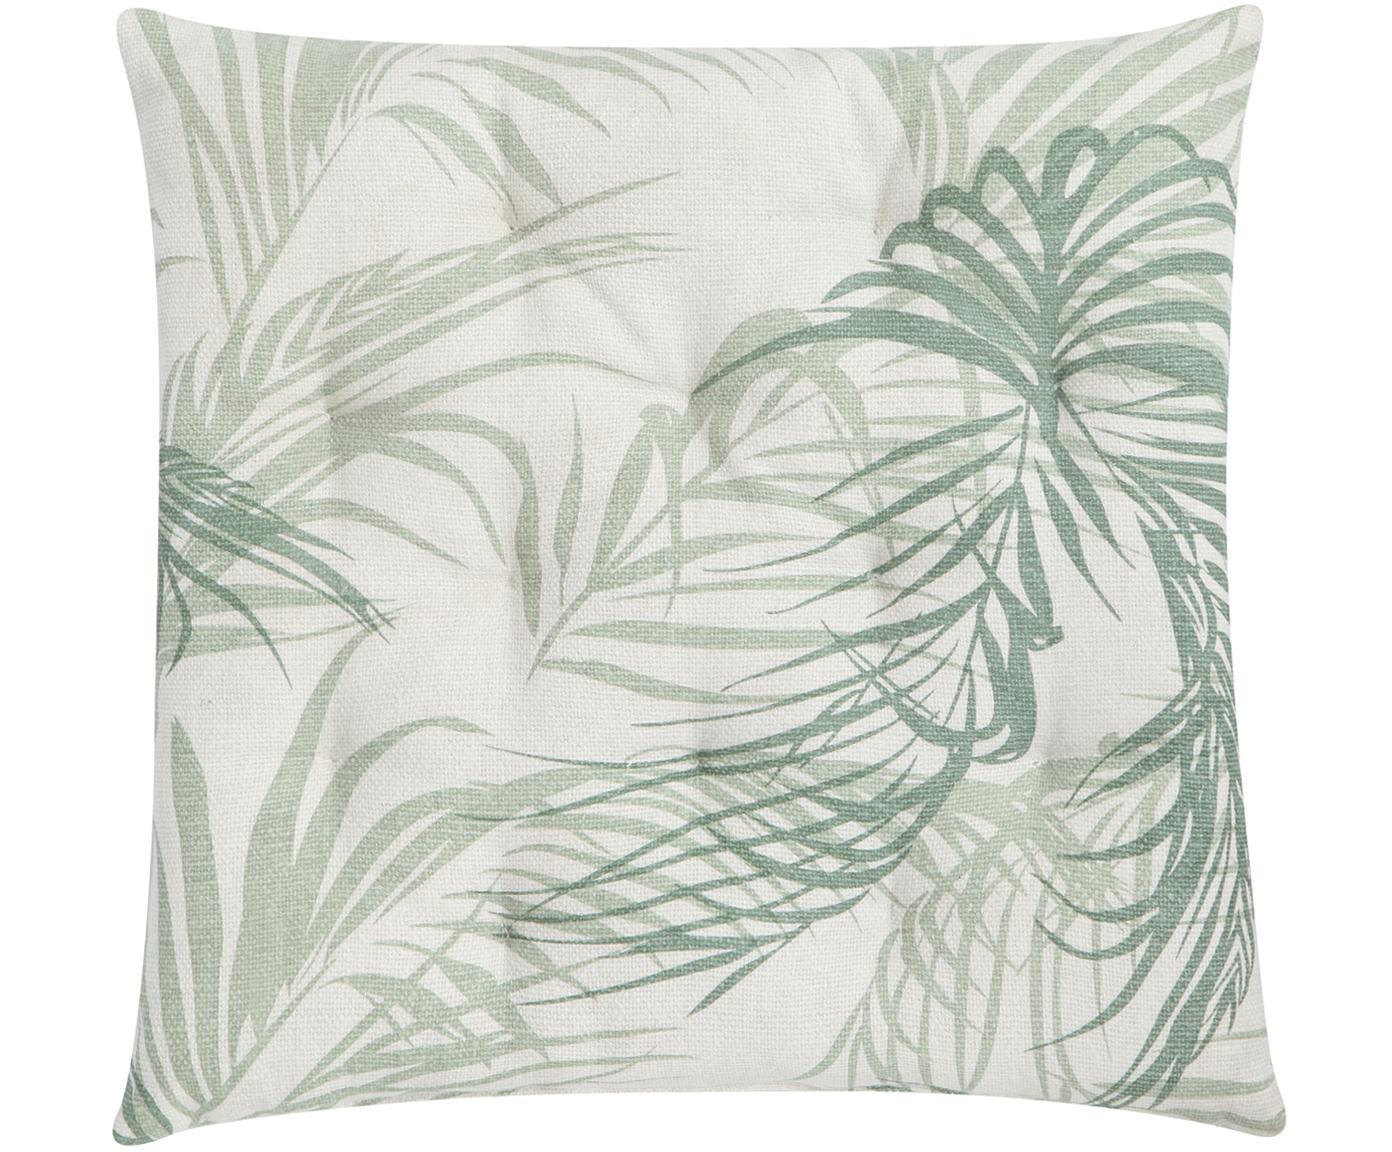 Cojín de asiento Palm Leaf, Funda: 100%algodón, Blanco crudo, verde, An 40 x L 40 cm